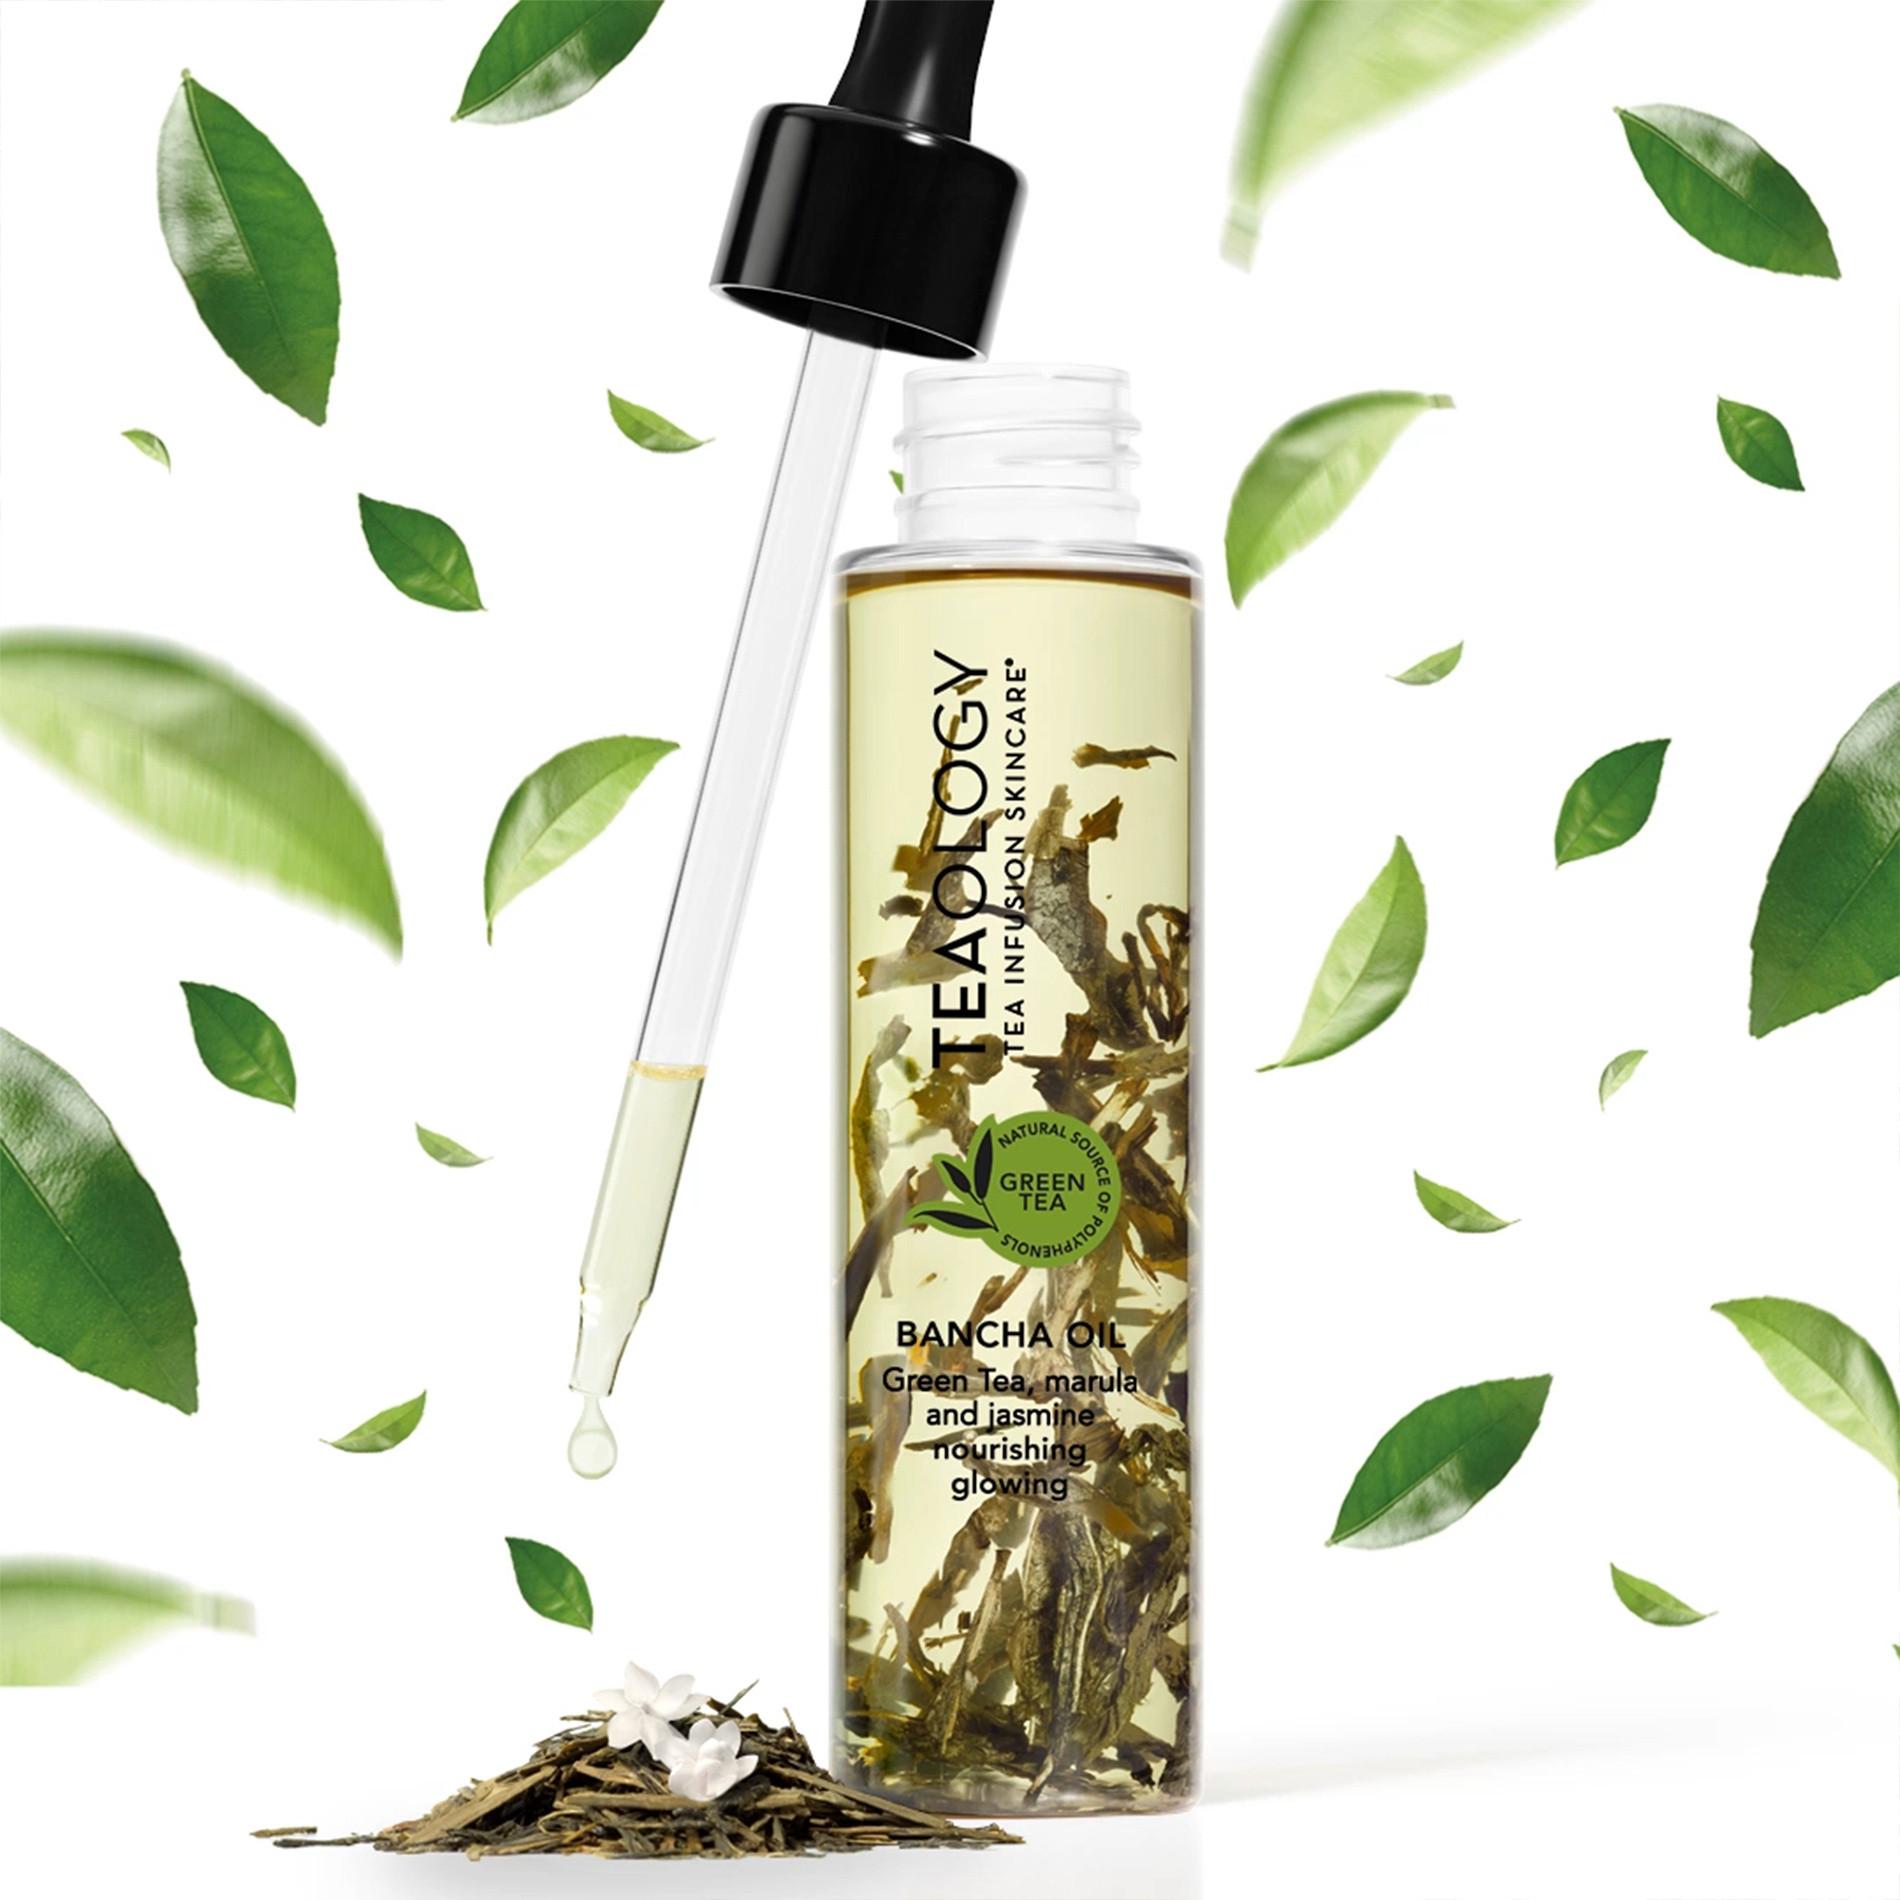 Teaology Bancha Oil 100 ml, Bianco, large image number 4